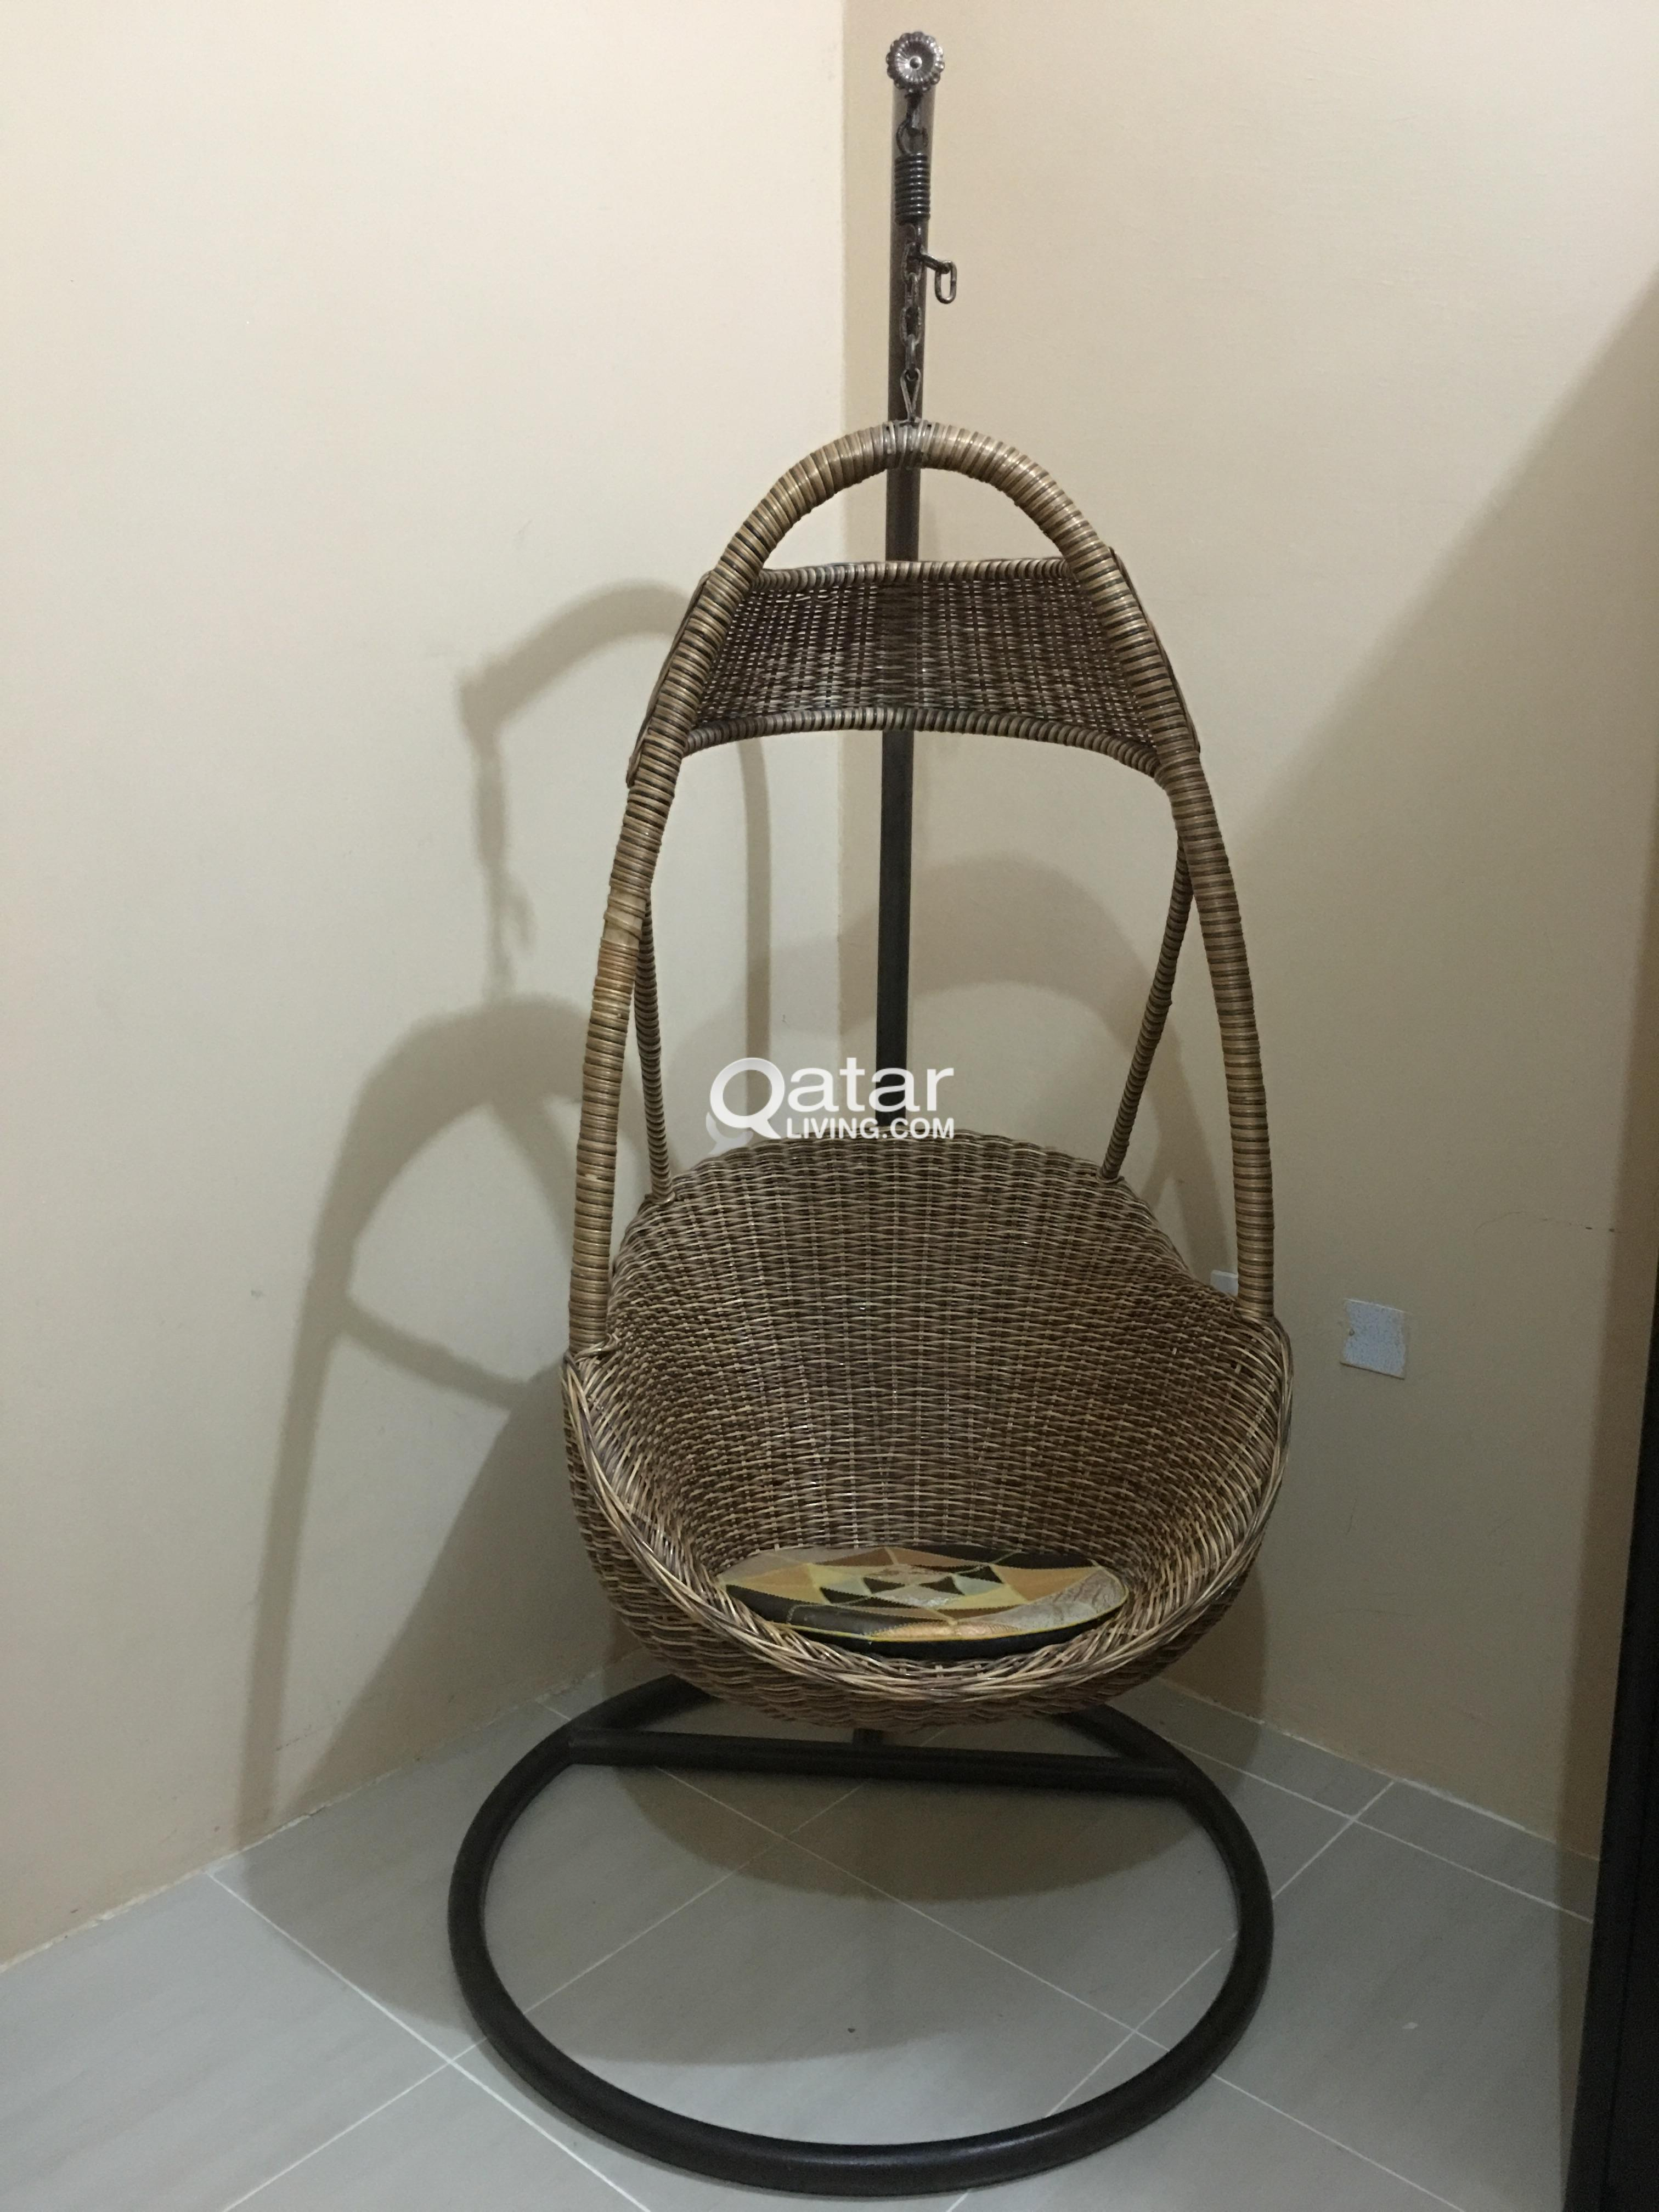 hanging chair qatar folding beach chairs costco swing living title